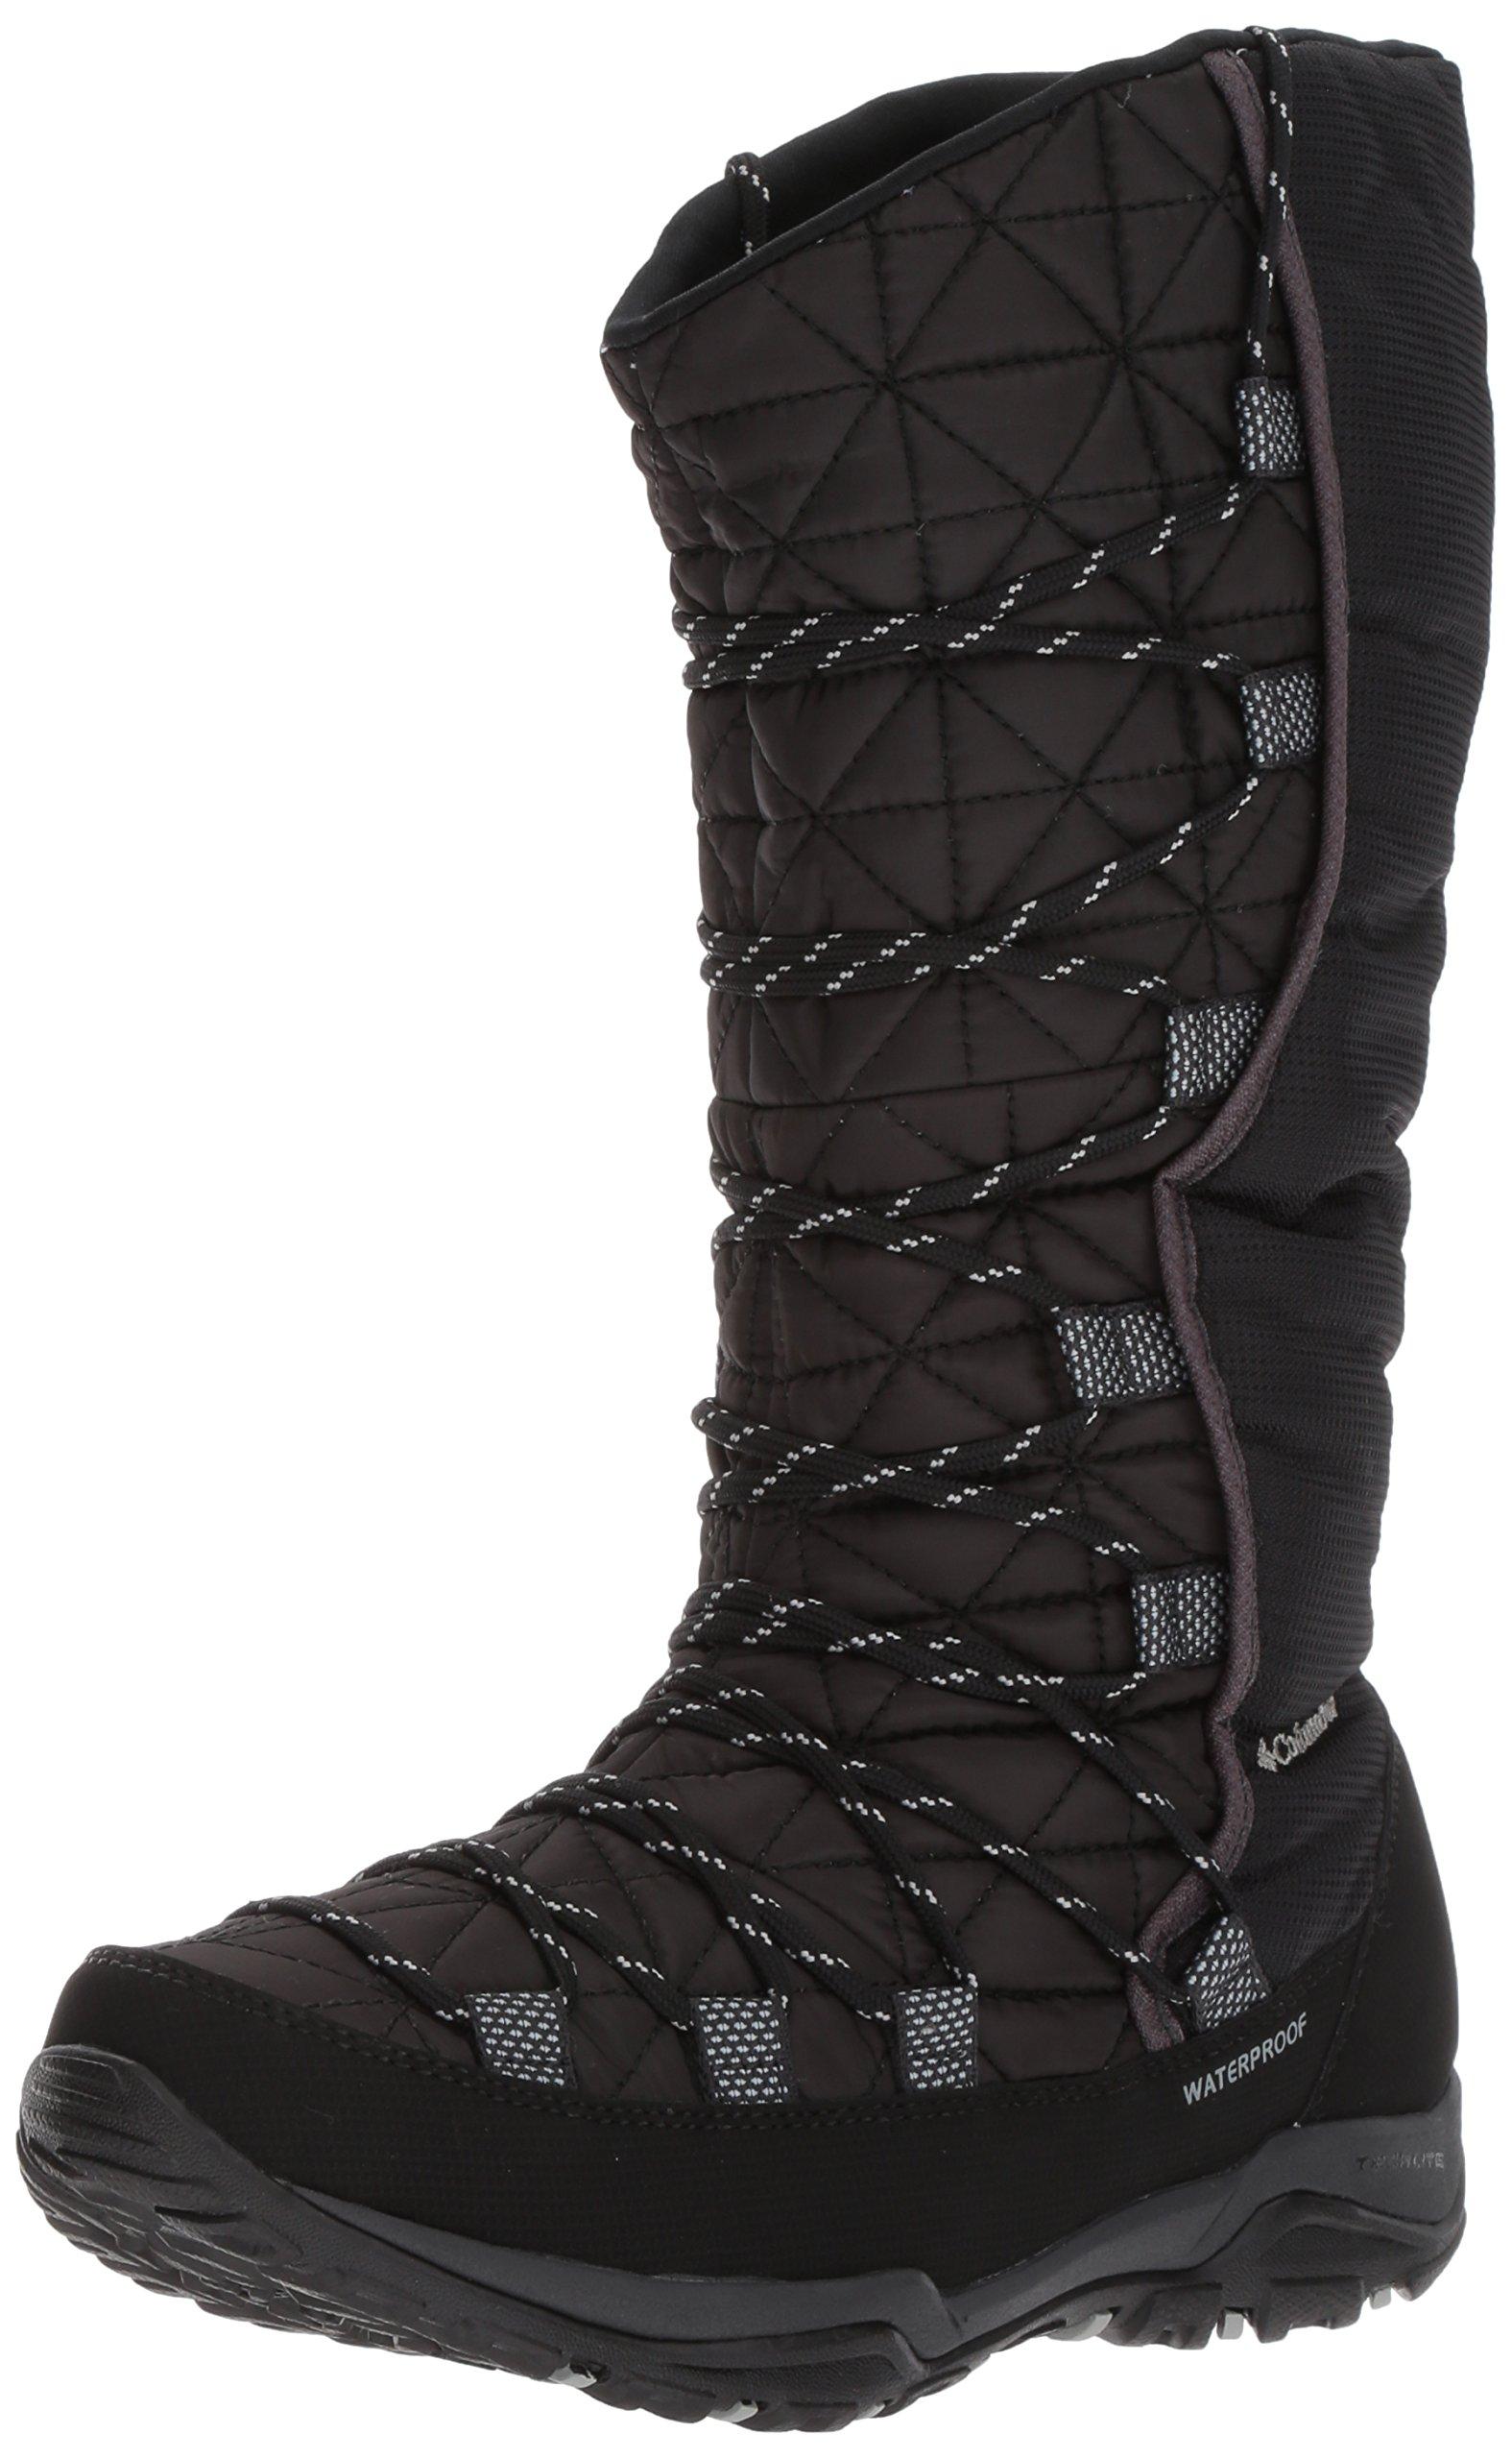 Columbia Women's Loveland Omni-Heat Snow Boot, Black, Earl Grey, 8.5 B US